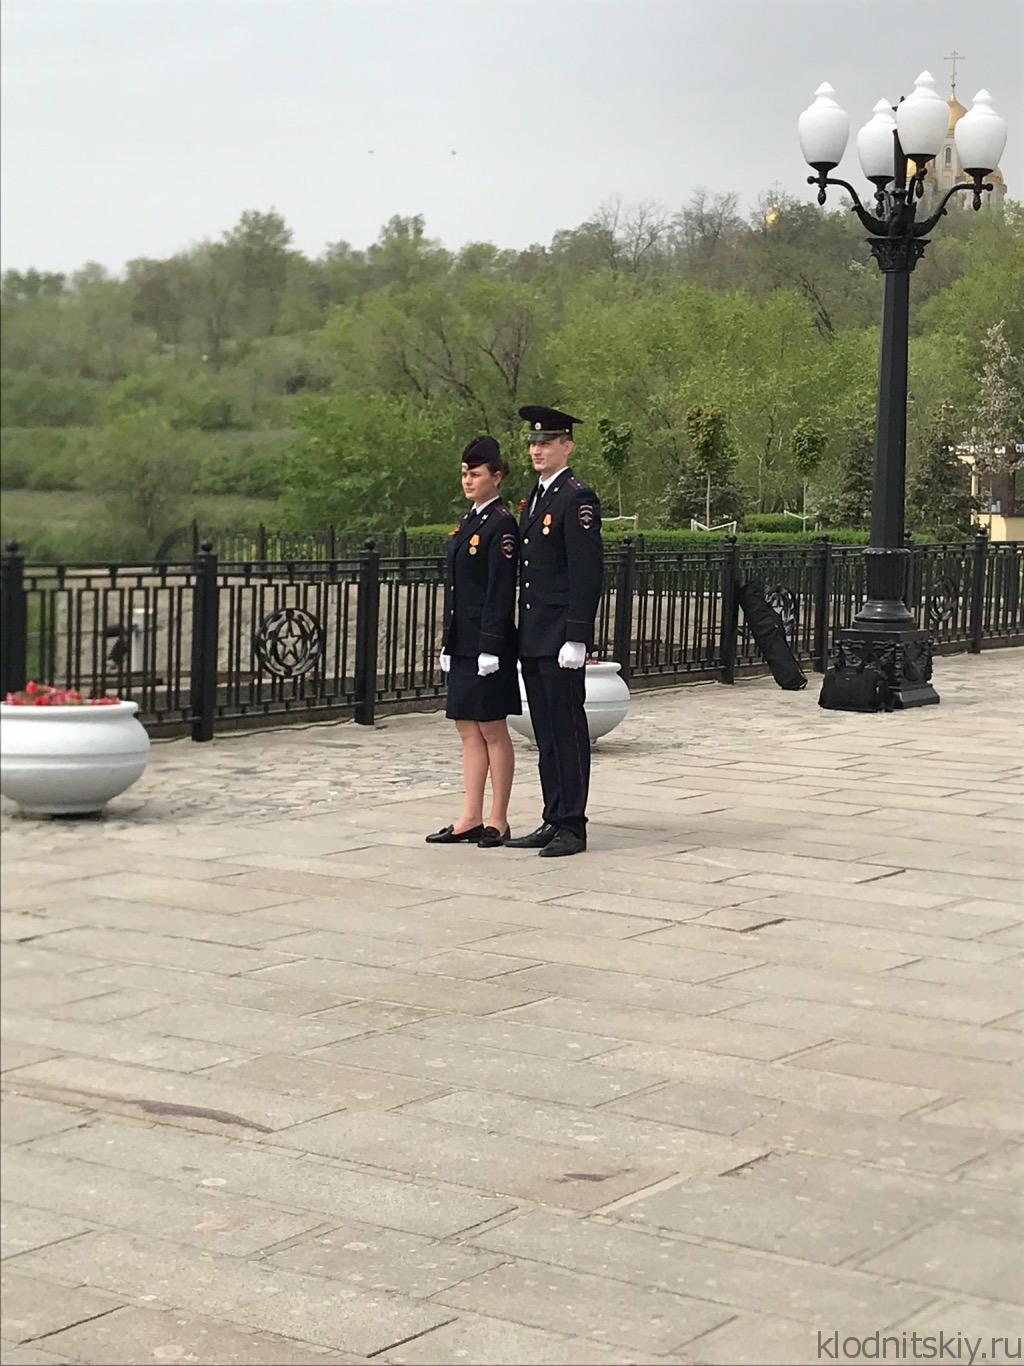 Автопутешествие Москва - Волгоград. Мамаев Курган.